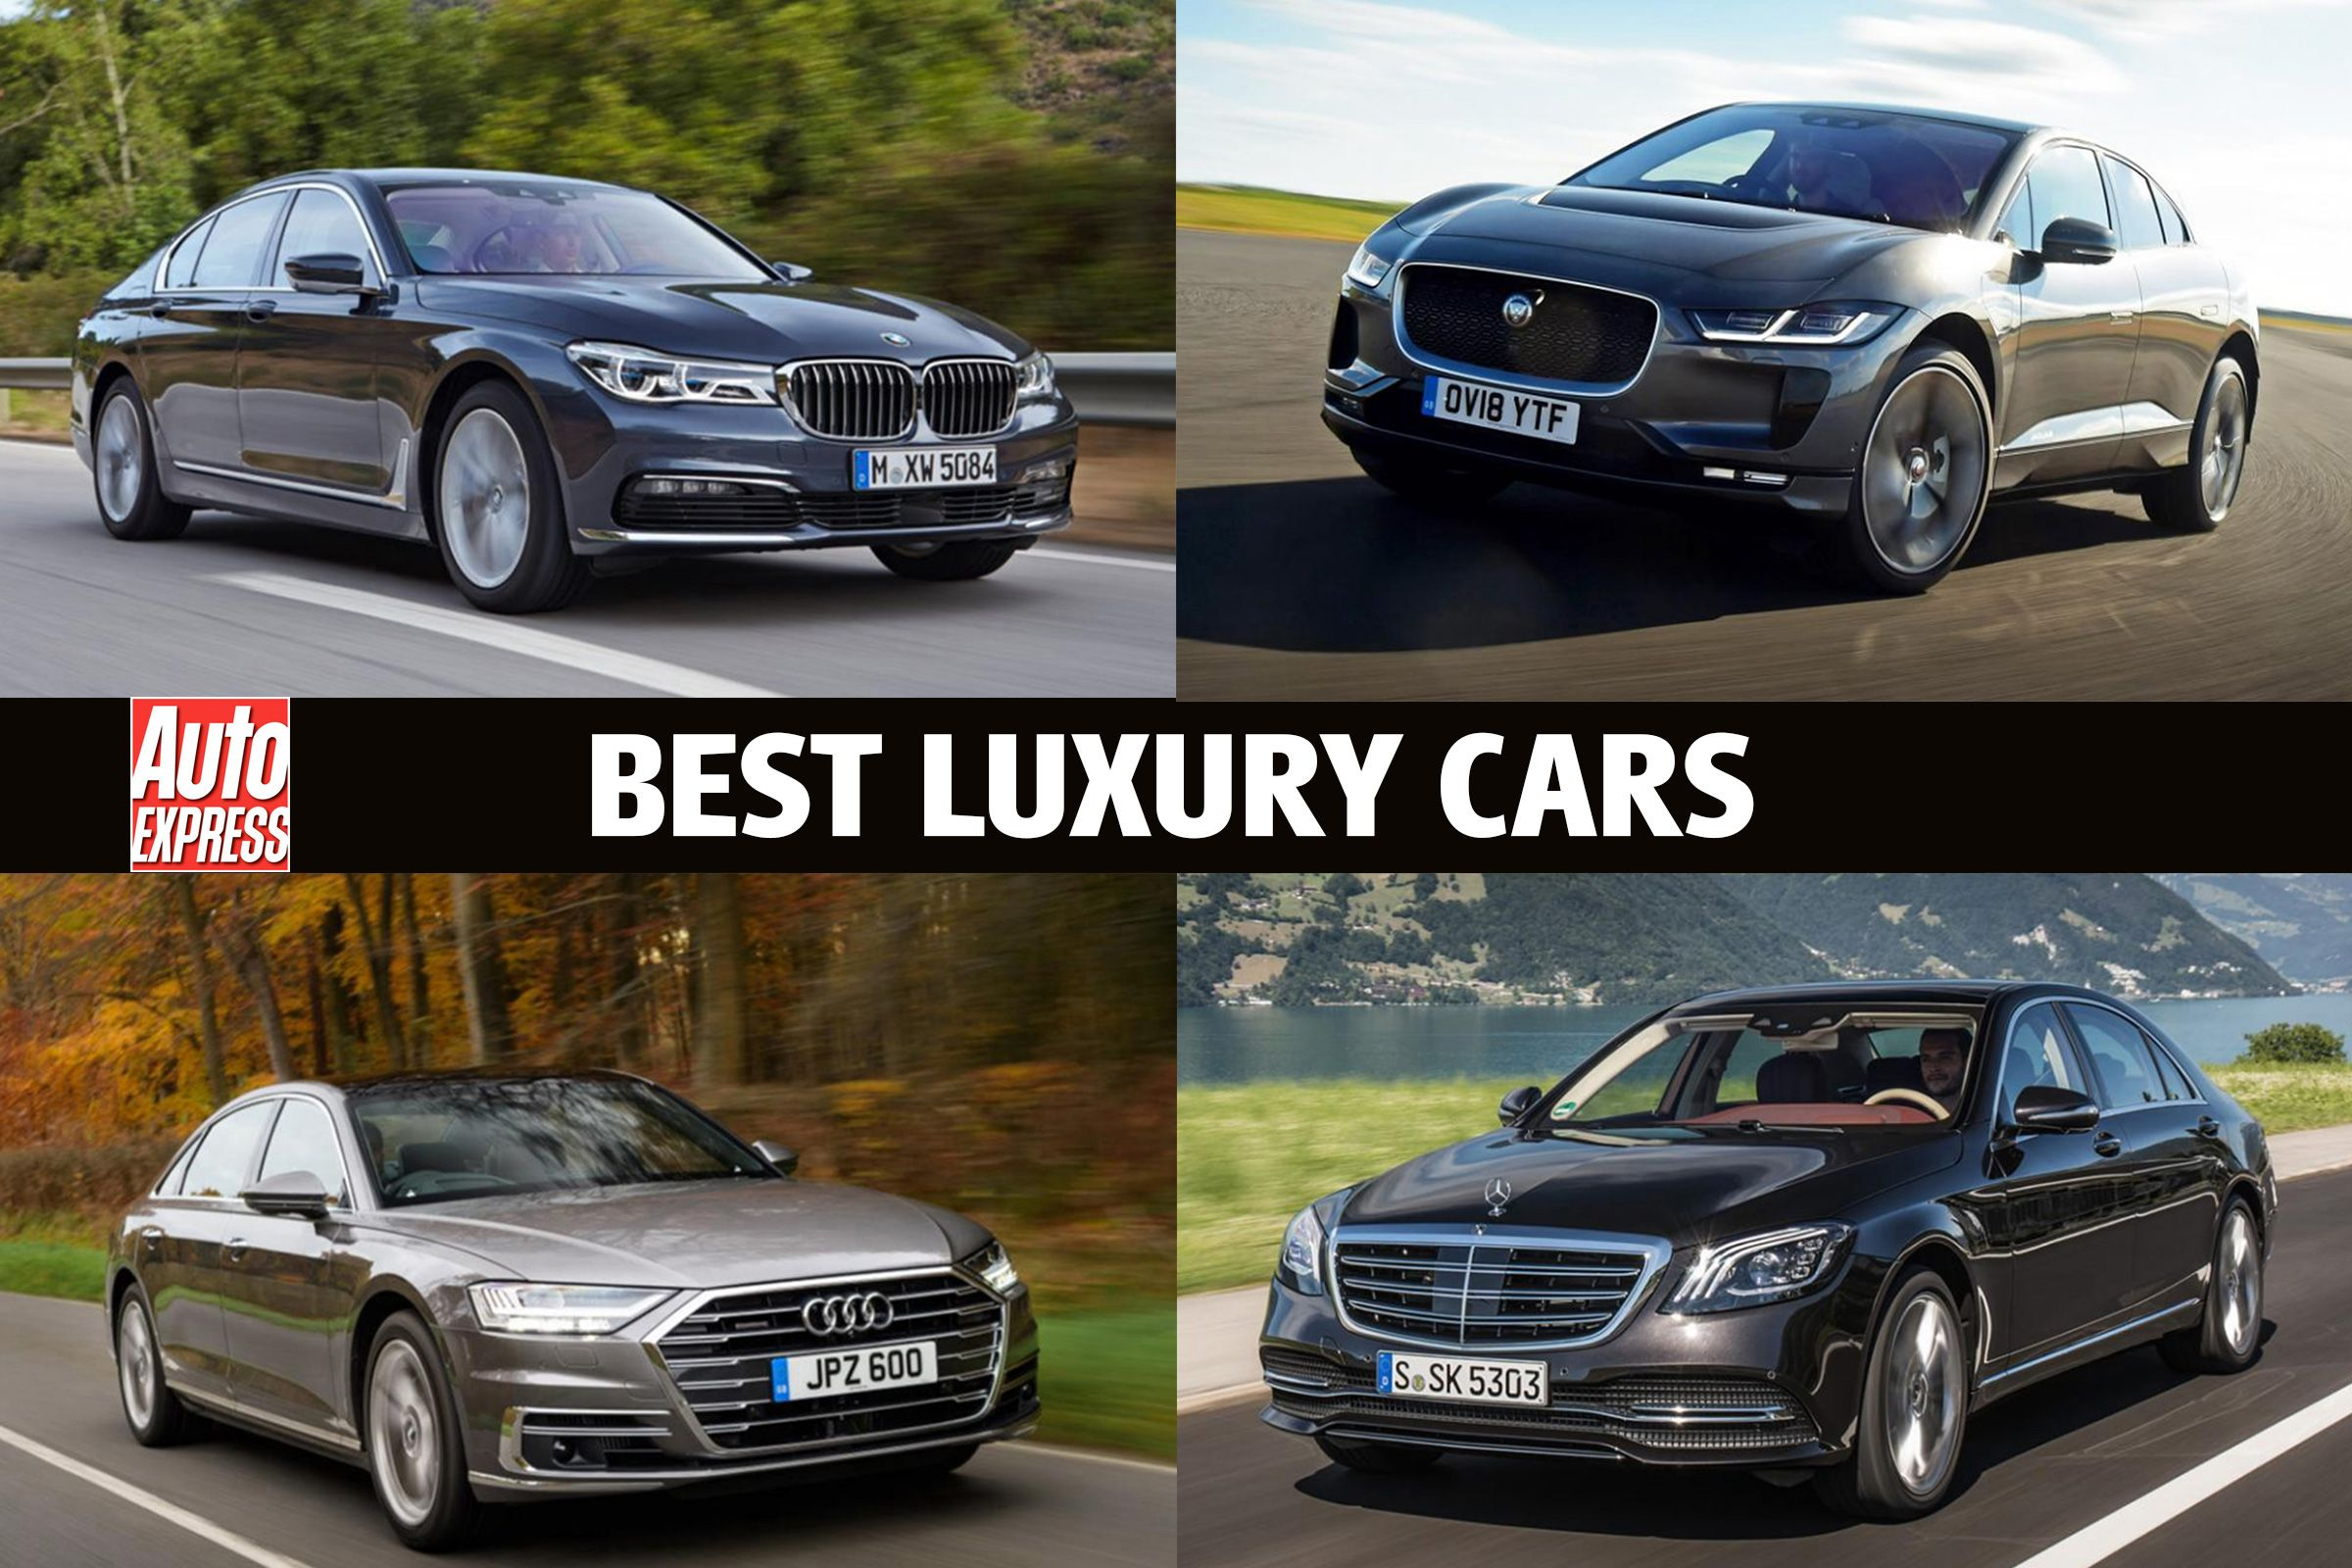 Top 10 Luxury Cars To Attract Women Best Luxury Cars Luxury Cars Top 10 Luxury Cars